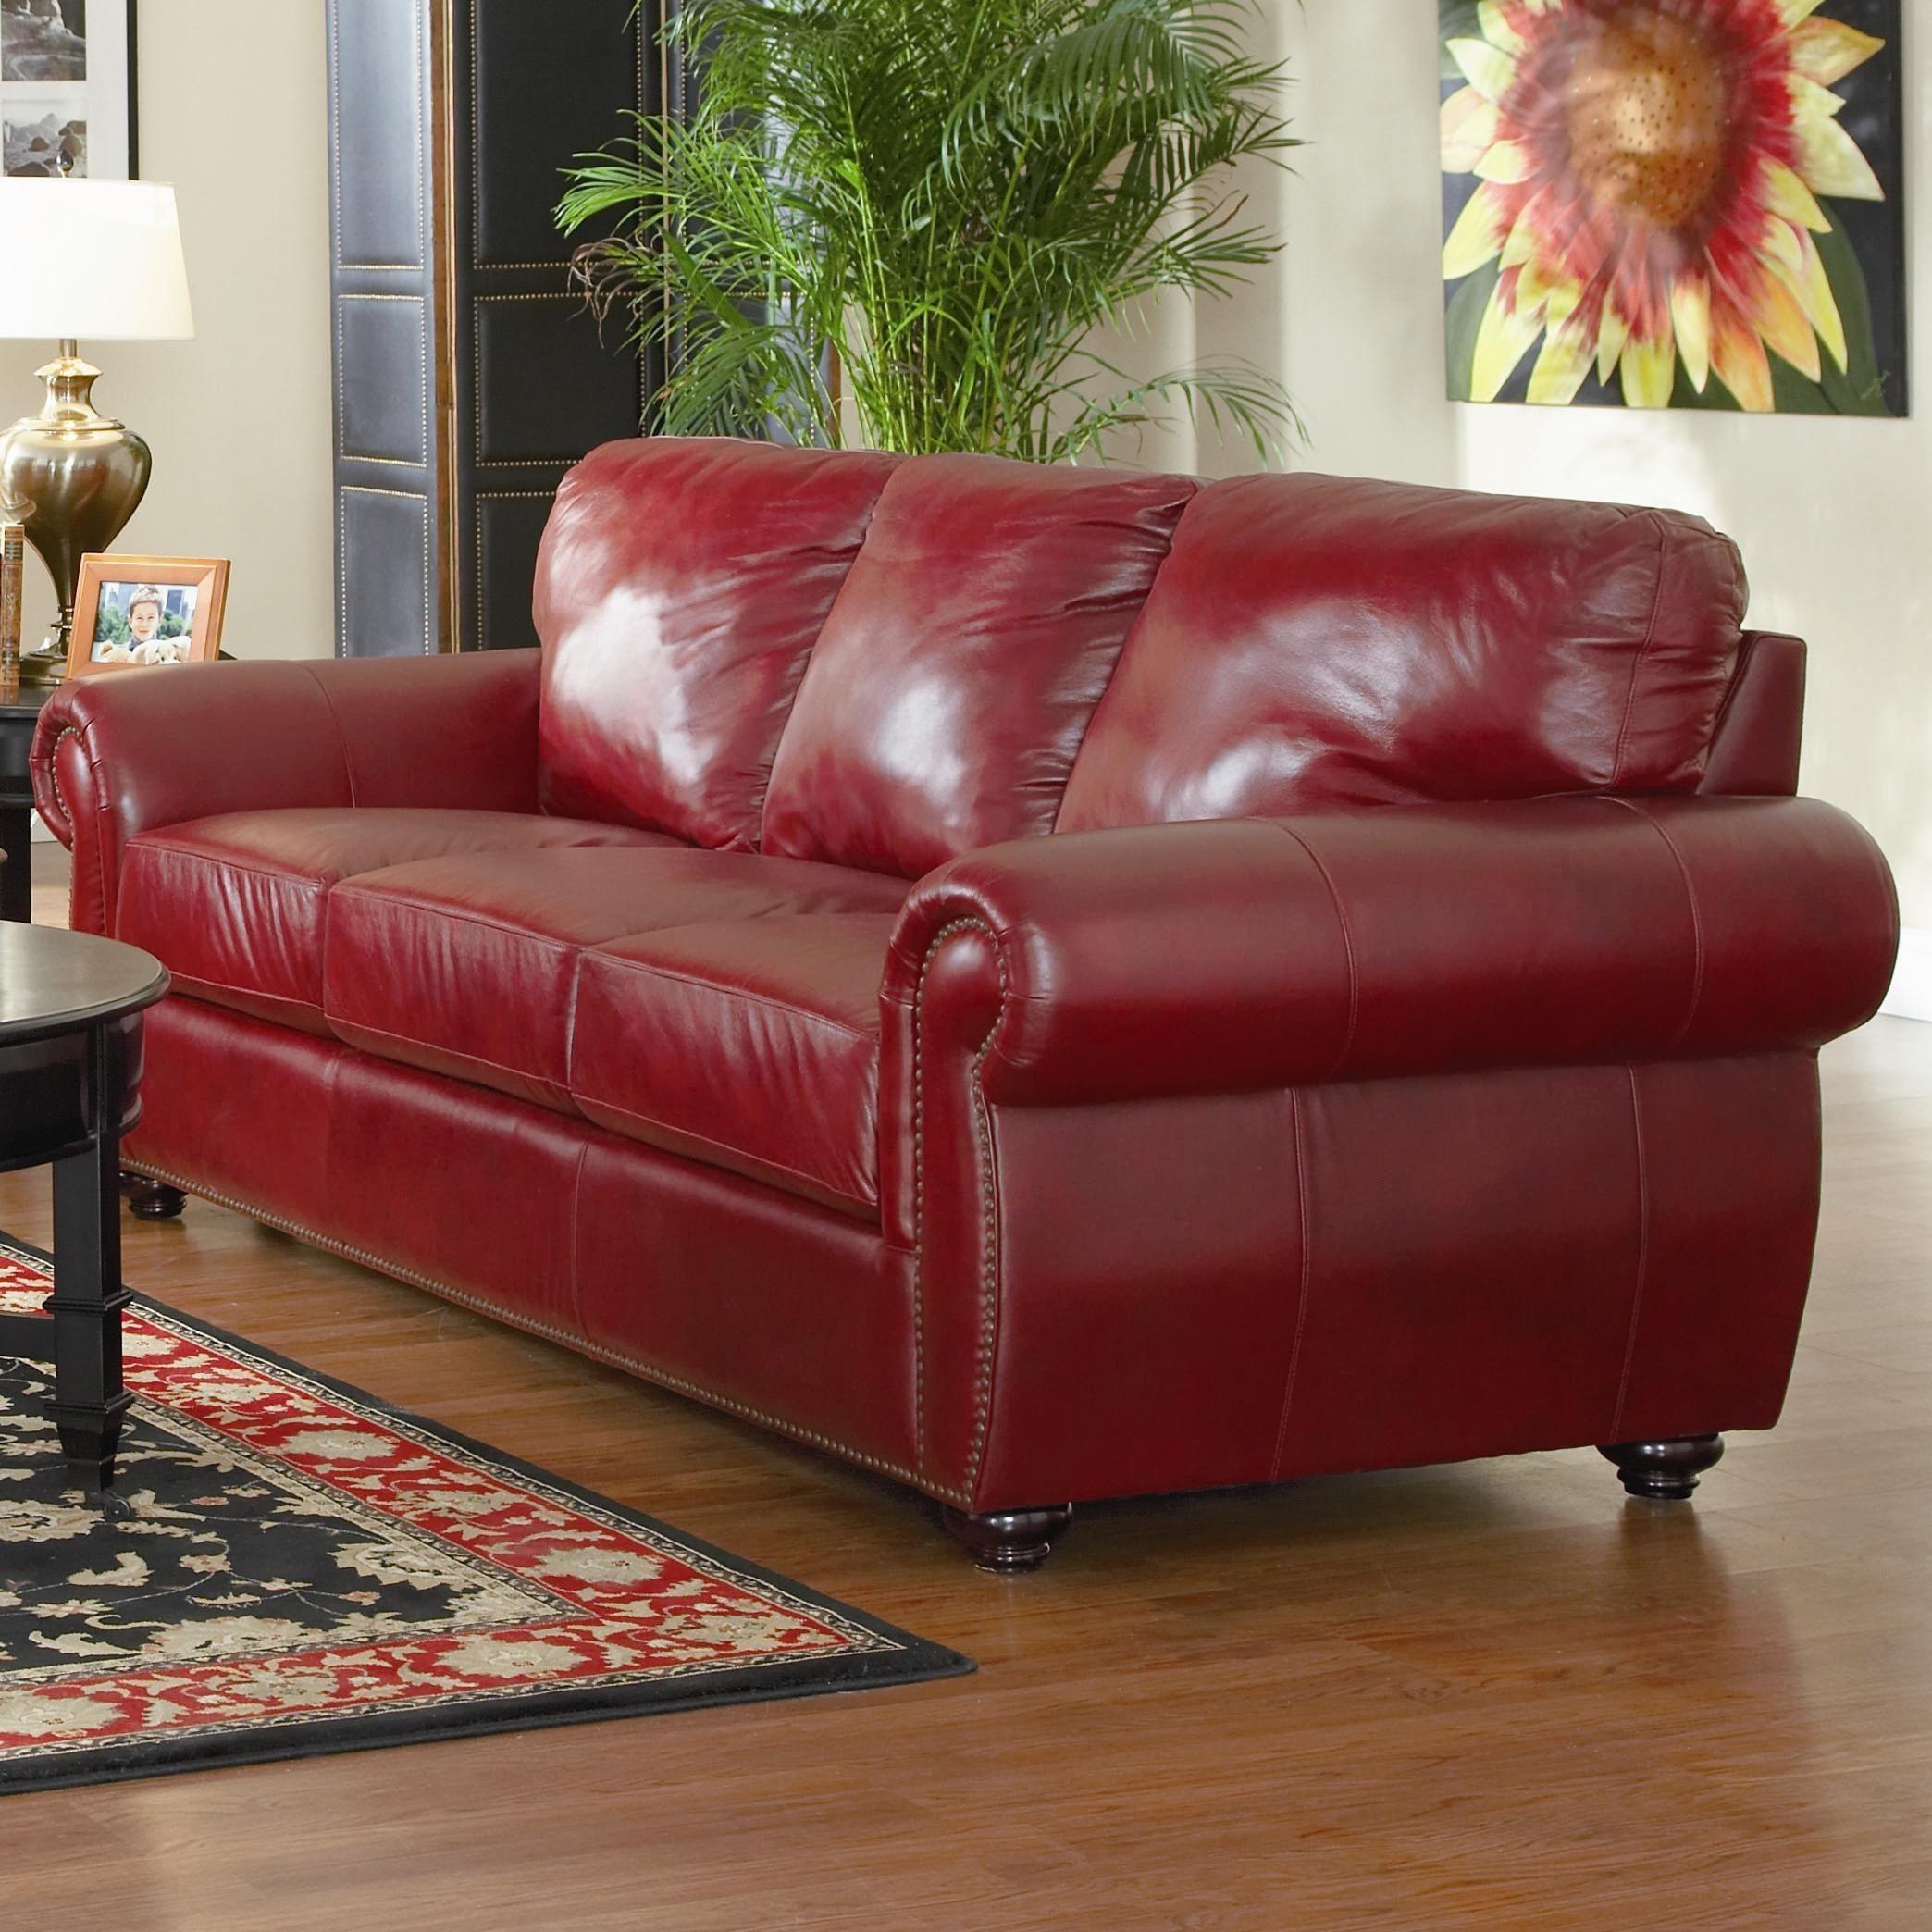 Burgundy Leather Sofa Set | Sofa Gallery | Kengire Inside Dark Red Leather Sofas (Image 3 of 20)